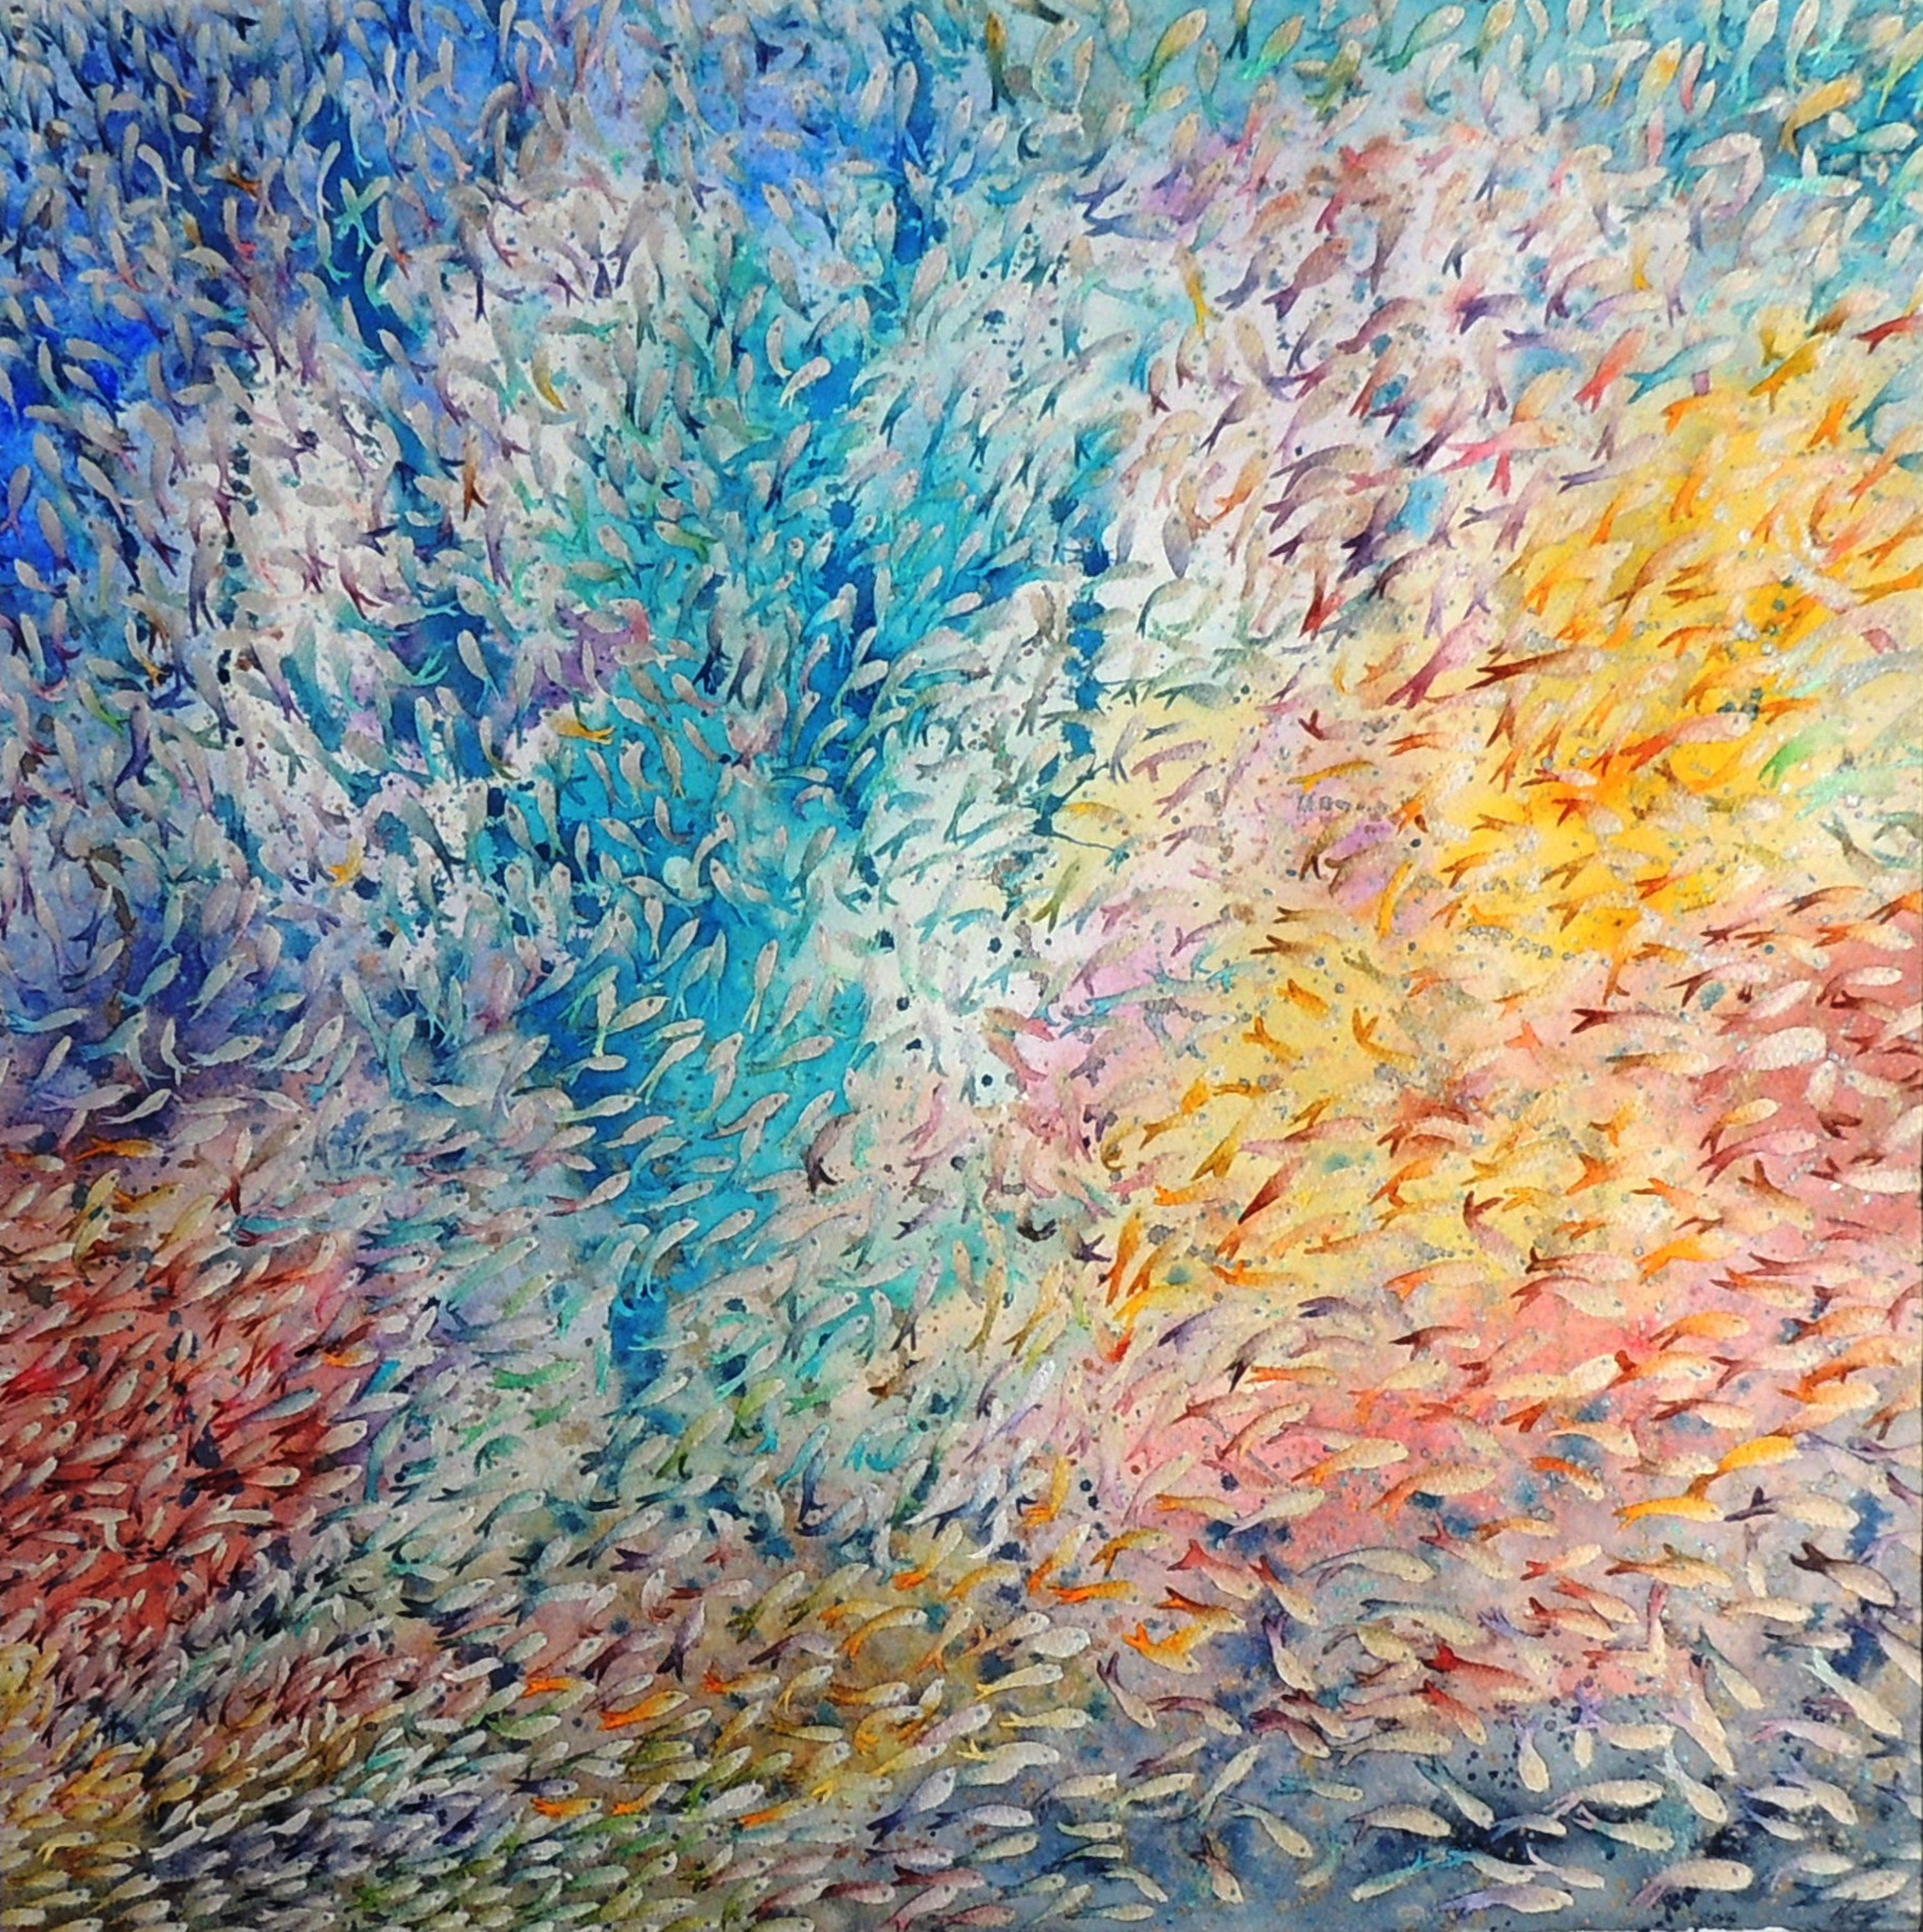 Cosmic Fish by Elizabeth Sadler